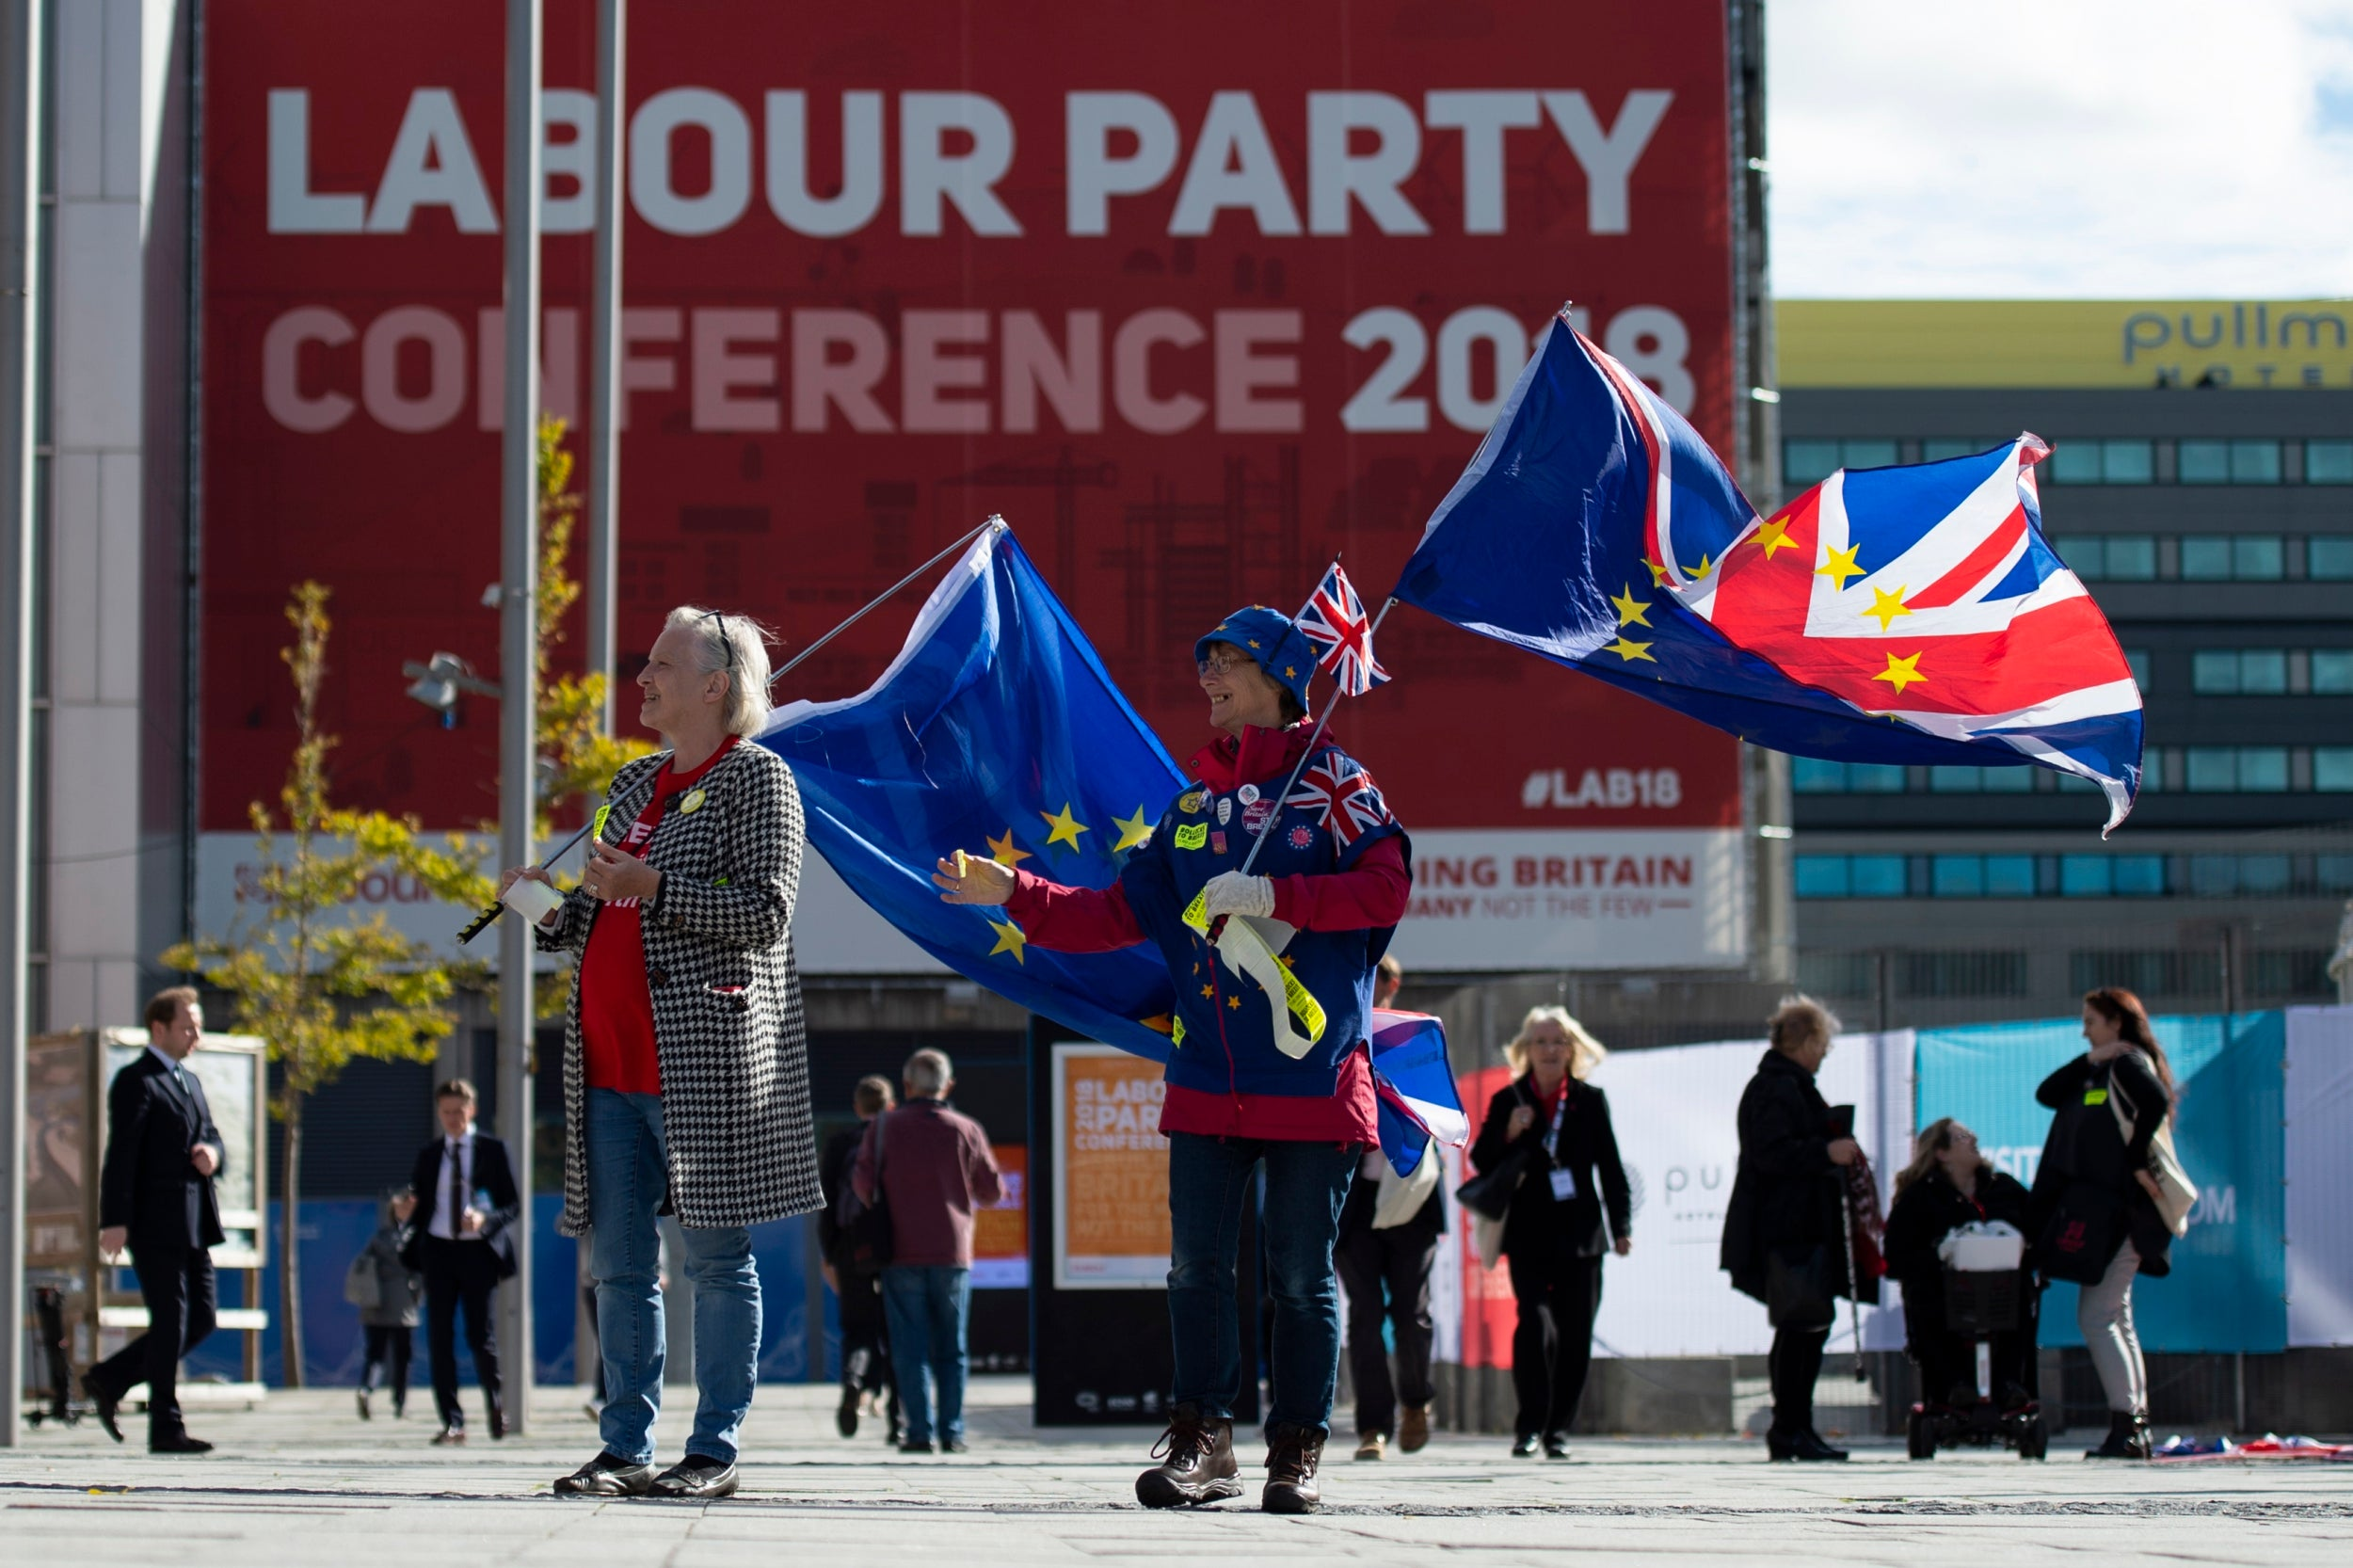 Labour Party (UK) explained